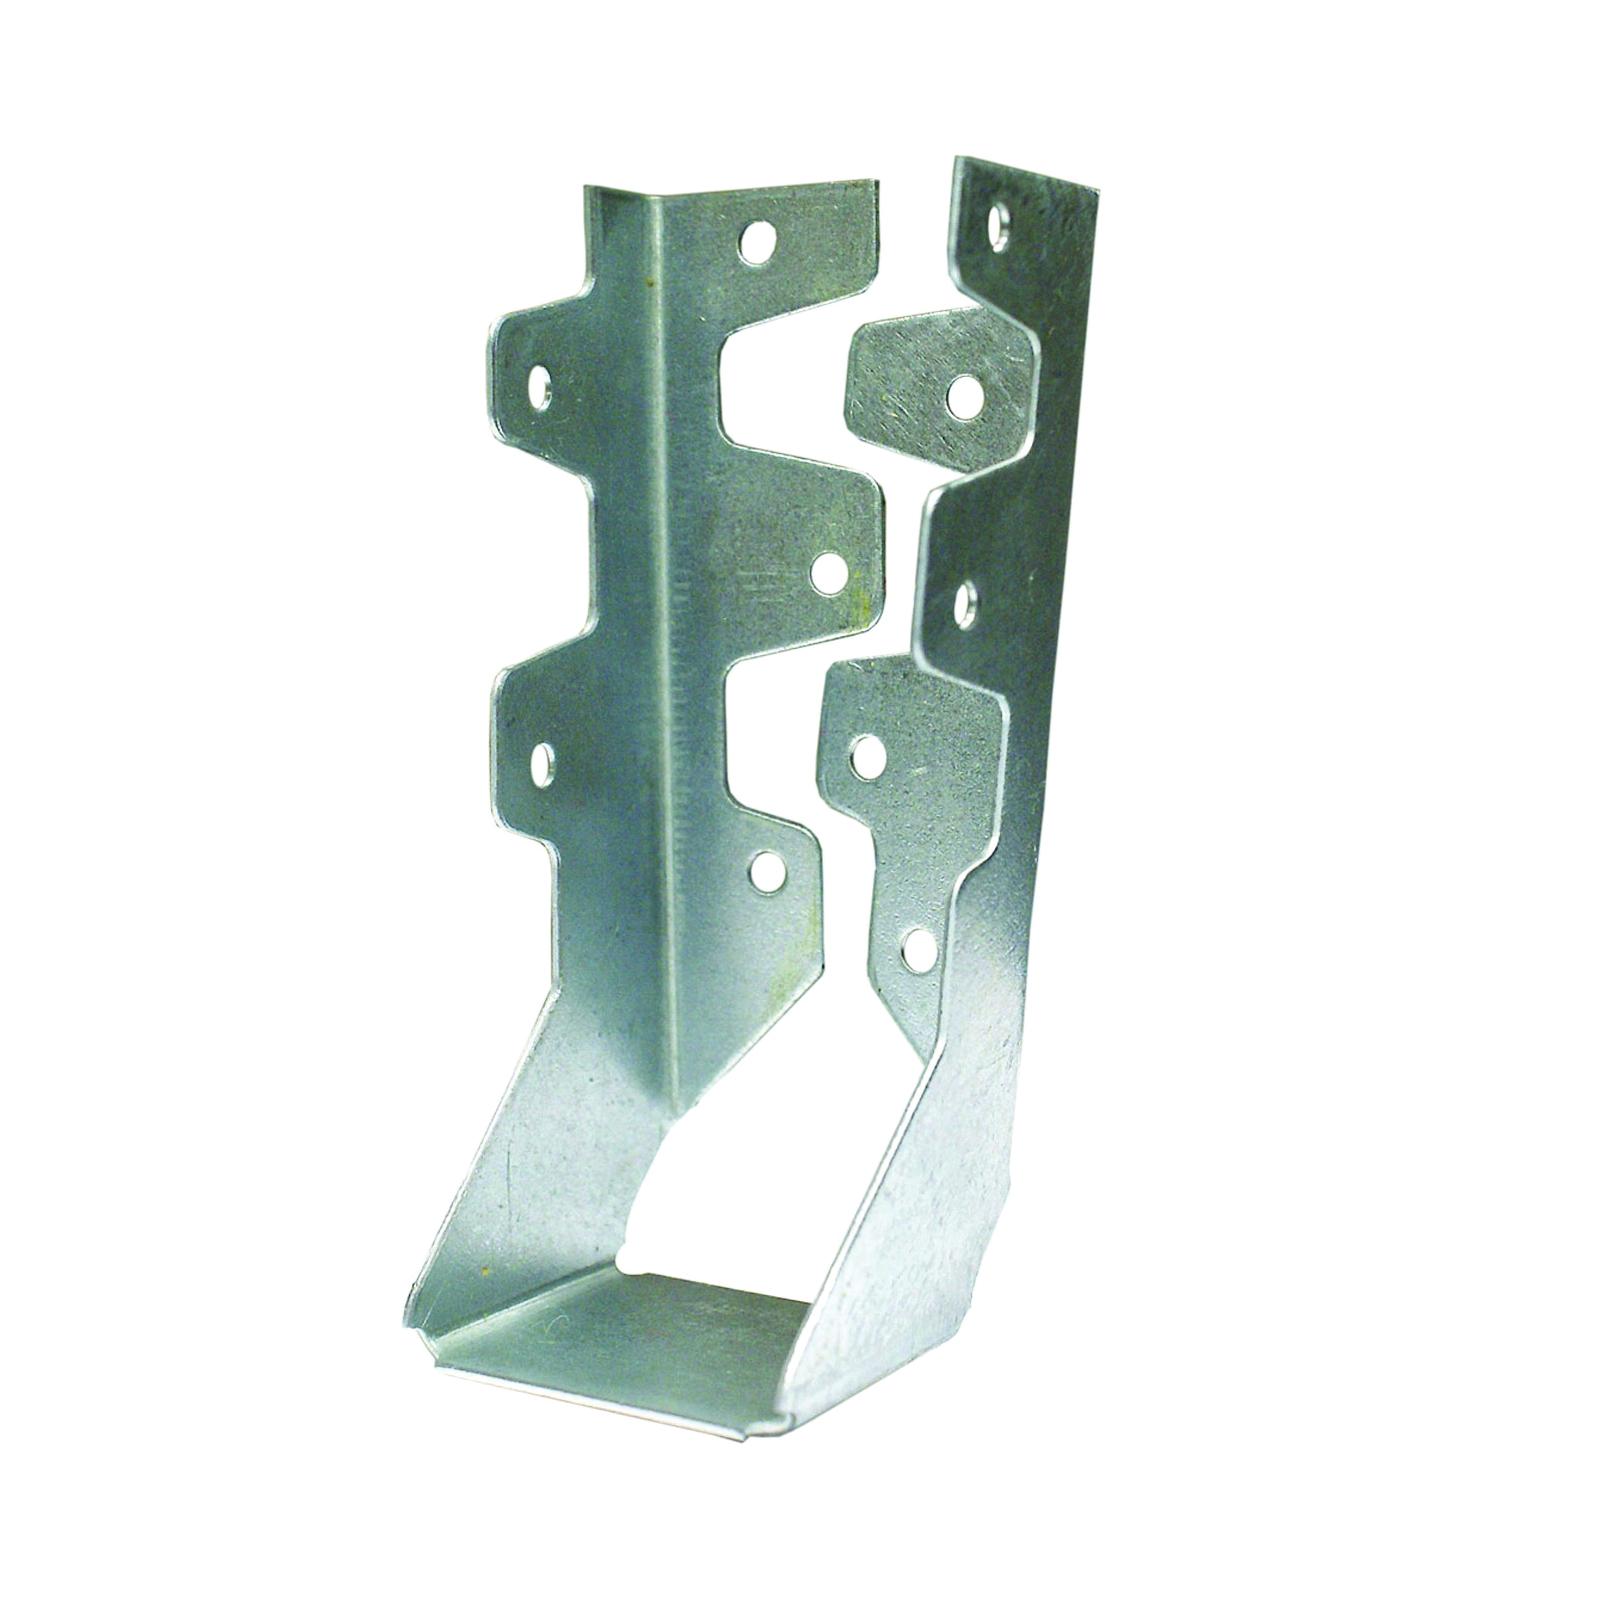 Picture of MiTek JL28IF-TZ Joist Hanger, 6-1/8 in H, 1-1/2 in D, 1-9/16 in W, 2 in x 8 to 10 in, Steel, Zinc, Face Mounting